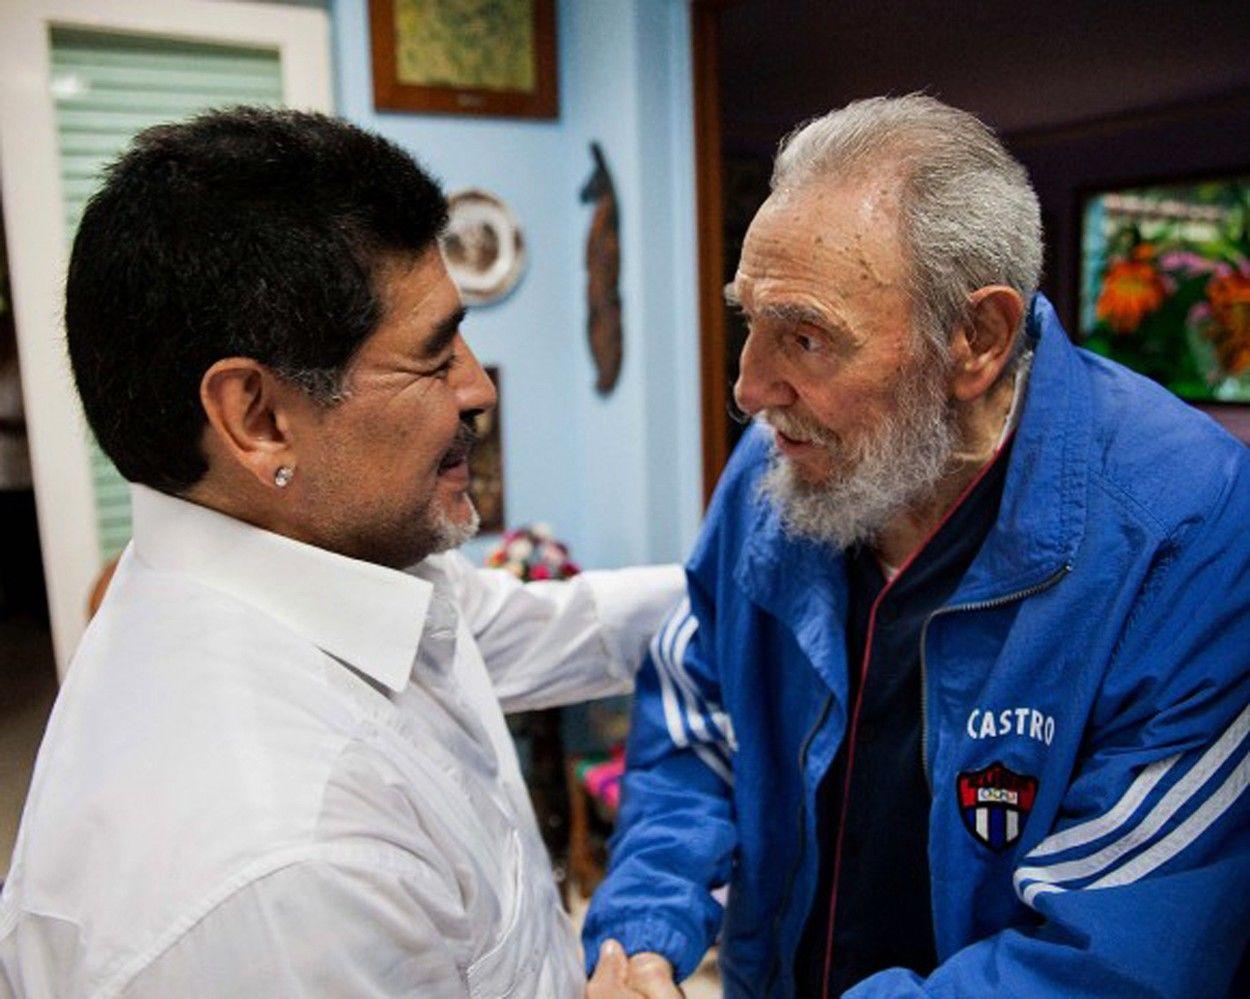 Fidel Castro és Diego Armando Maradona 2013-ban, Havannában. (Fotó: Cubadebate / Zuma Press / Profimedia)